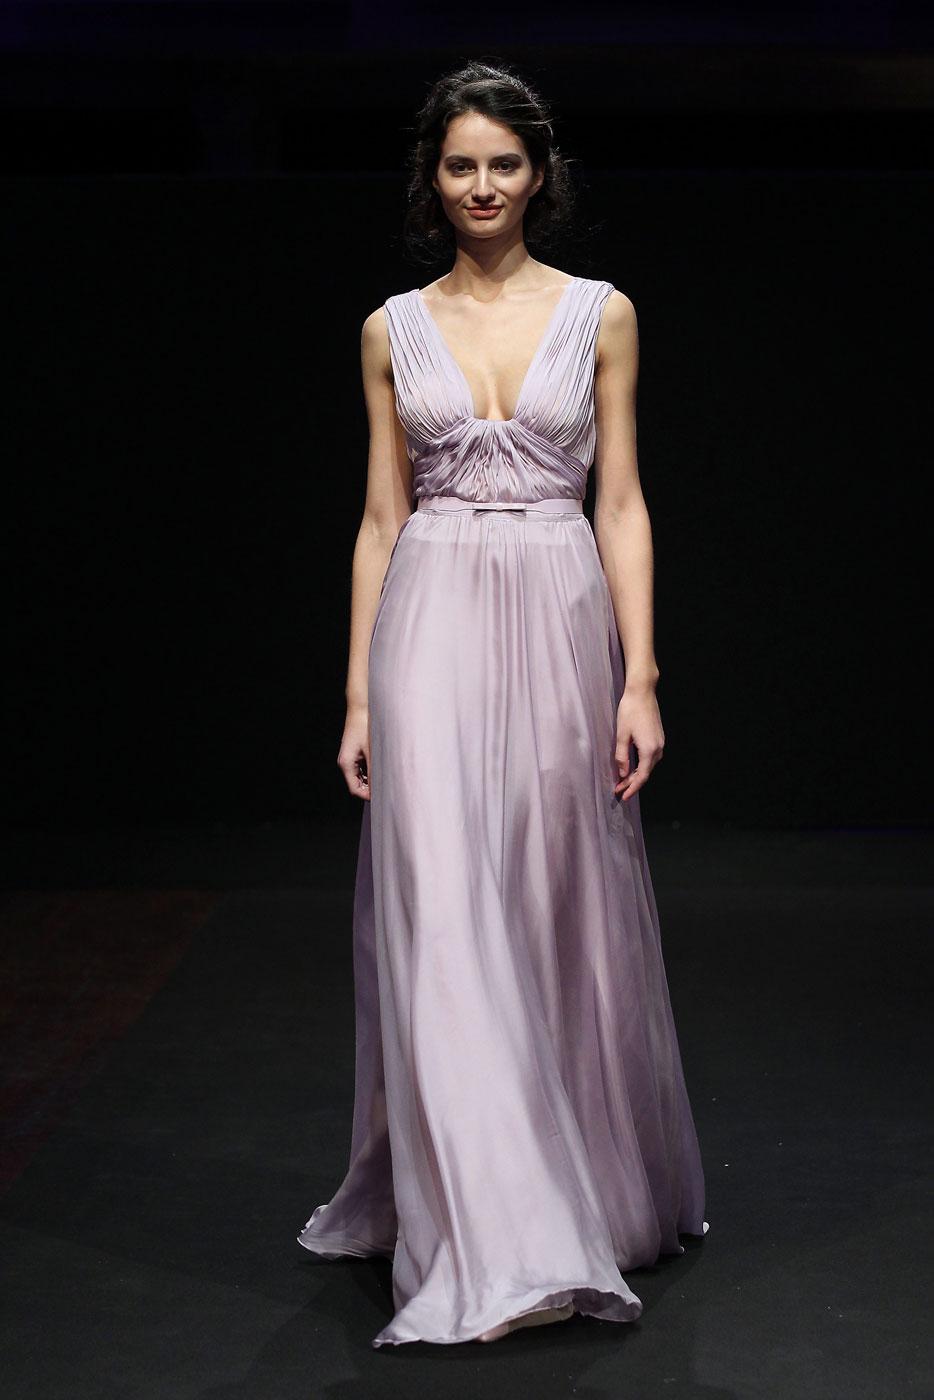 Abed-Mahfouz-fashion-runway-show-haute-couture-paris-spring-2015-the-impression-13